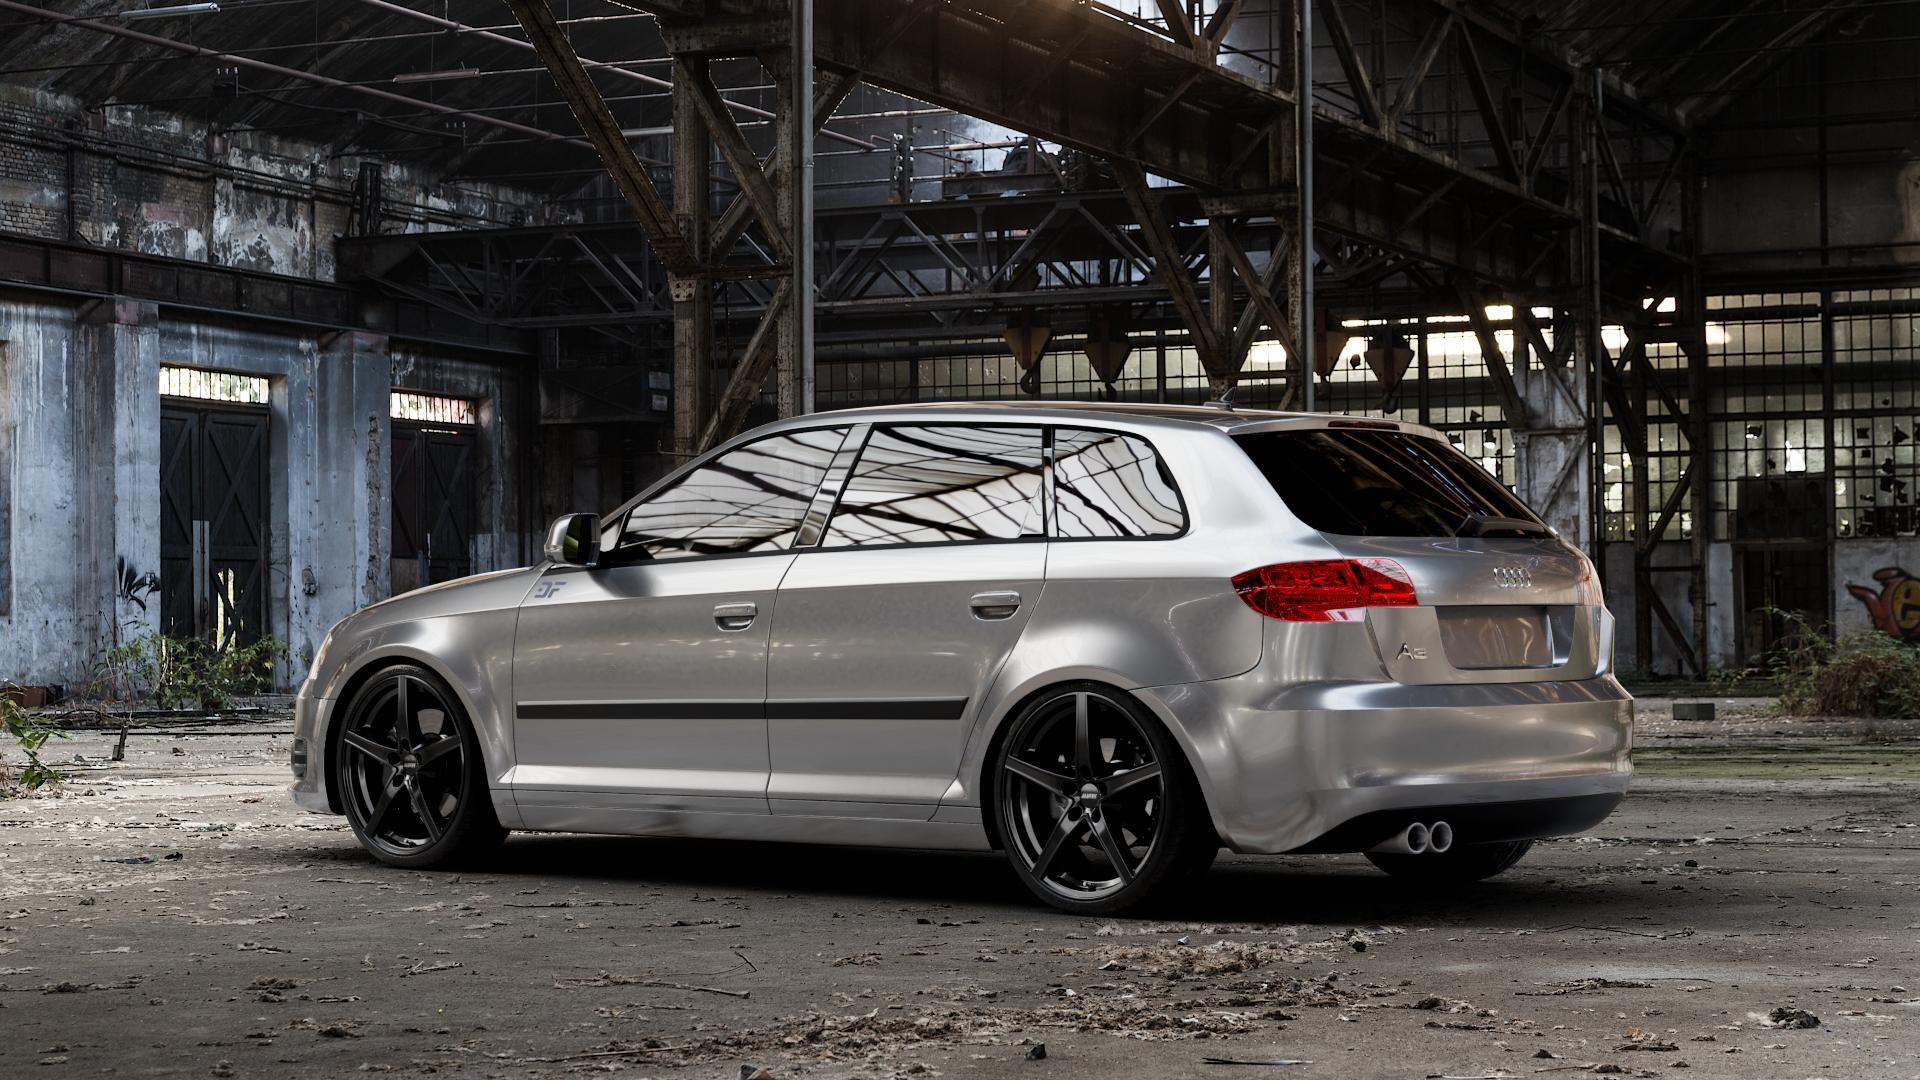 ALUTEC Raptr racing-schwarz Felge mit Reifen in 19Zoll Winterfelge Alufelge auf silbernem Audi A3 Typ 8P (Sportback) 1,6l 75kW (102 PS) 2,0l FSI 110kW (150 1,9l TDI 77kW (105 103kW (140 TFSI 147kW (200 85kW (116 100kW (136 1,8l 118kW (160 125kW (170 1,4l 92kW (125 120kW (163 quattro 3,2l V6 184kW (250 S3 195kW (265 1,2l 66kW (90